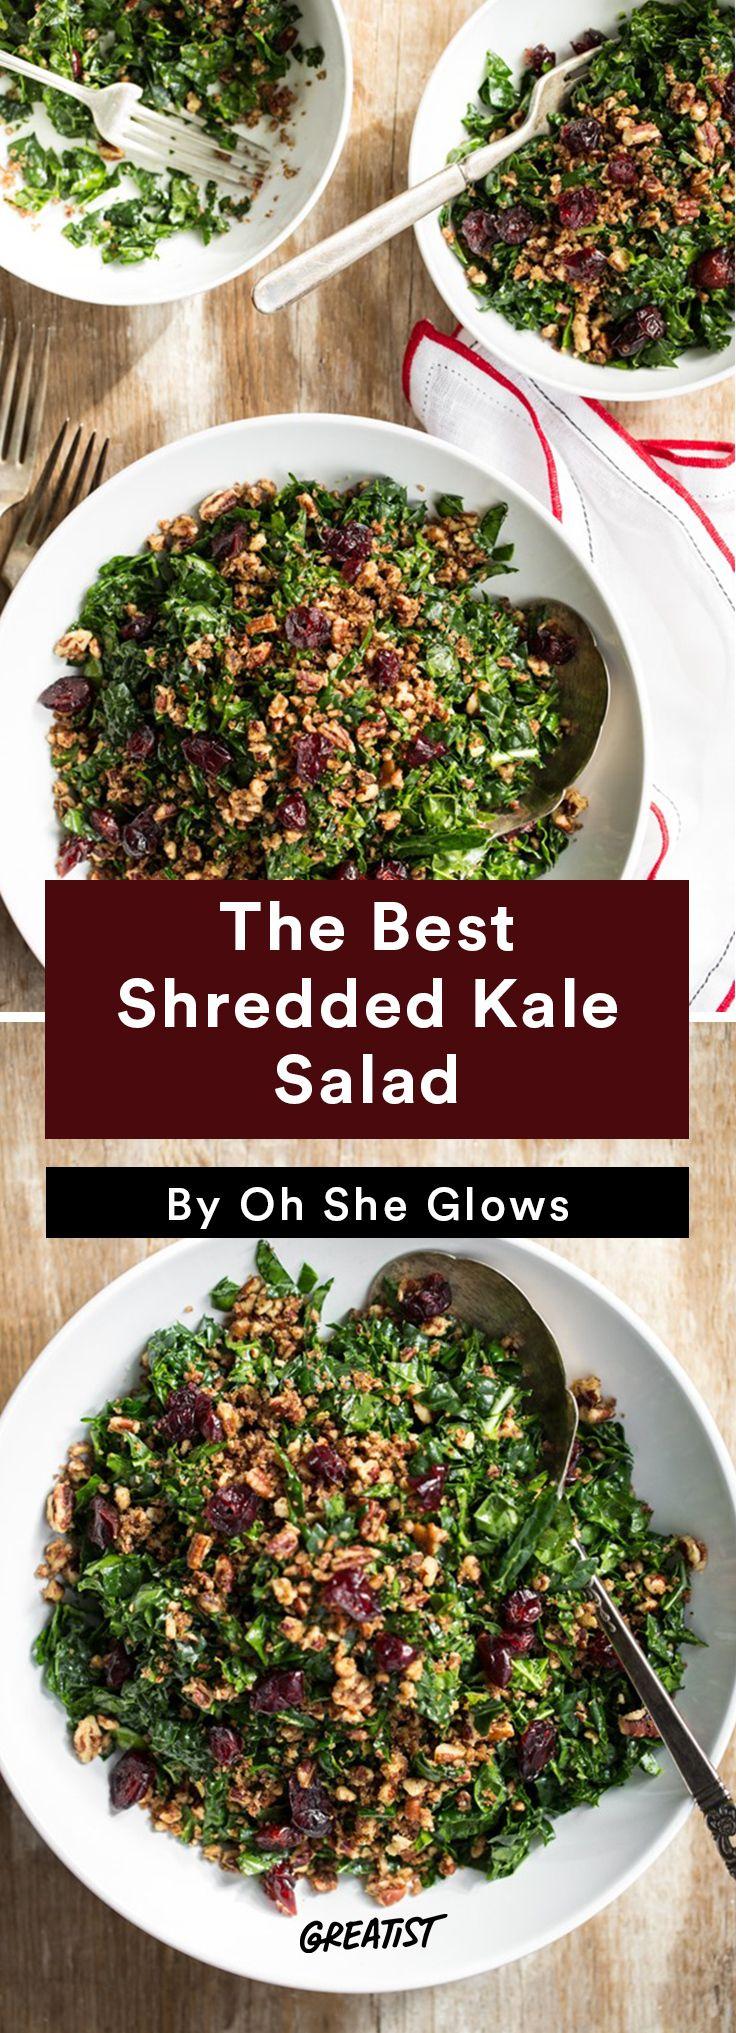 4. The Best Shredded Kale Salad #vegan #bowl #recipes http://greatist.com/eat/vegan-bowl-recipes-we-cant-get-enough-of